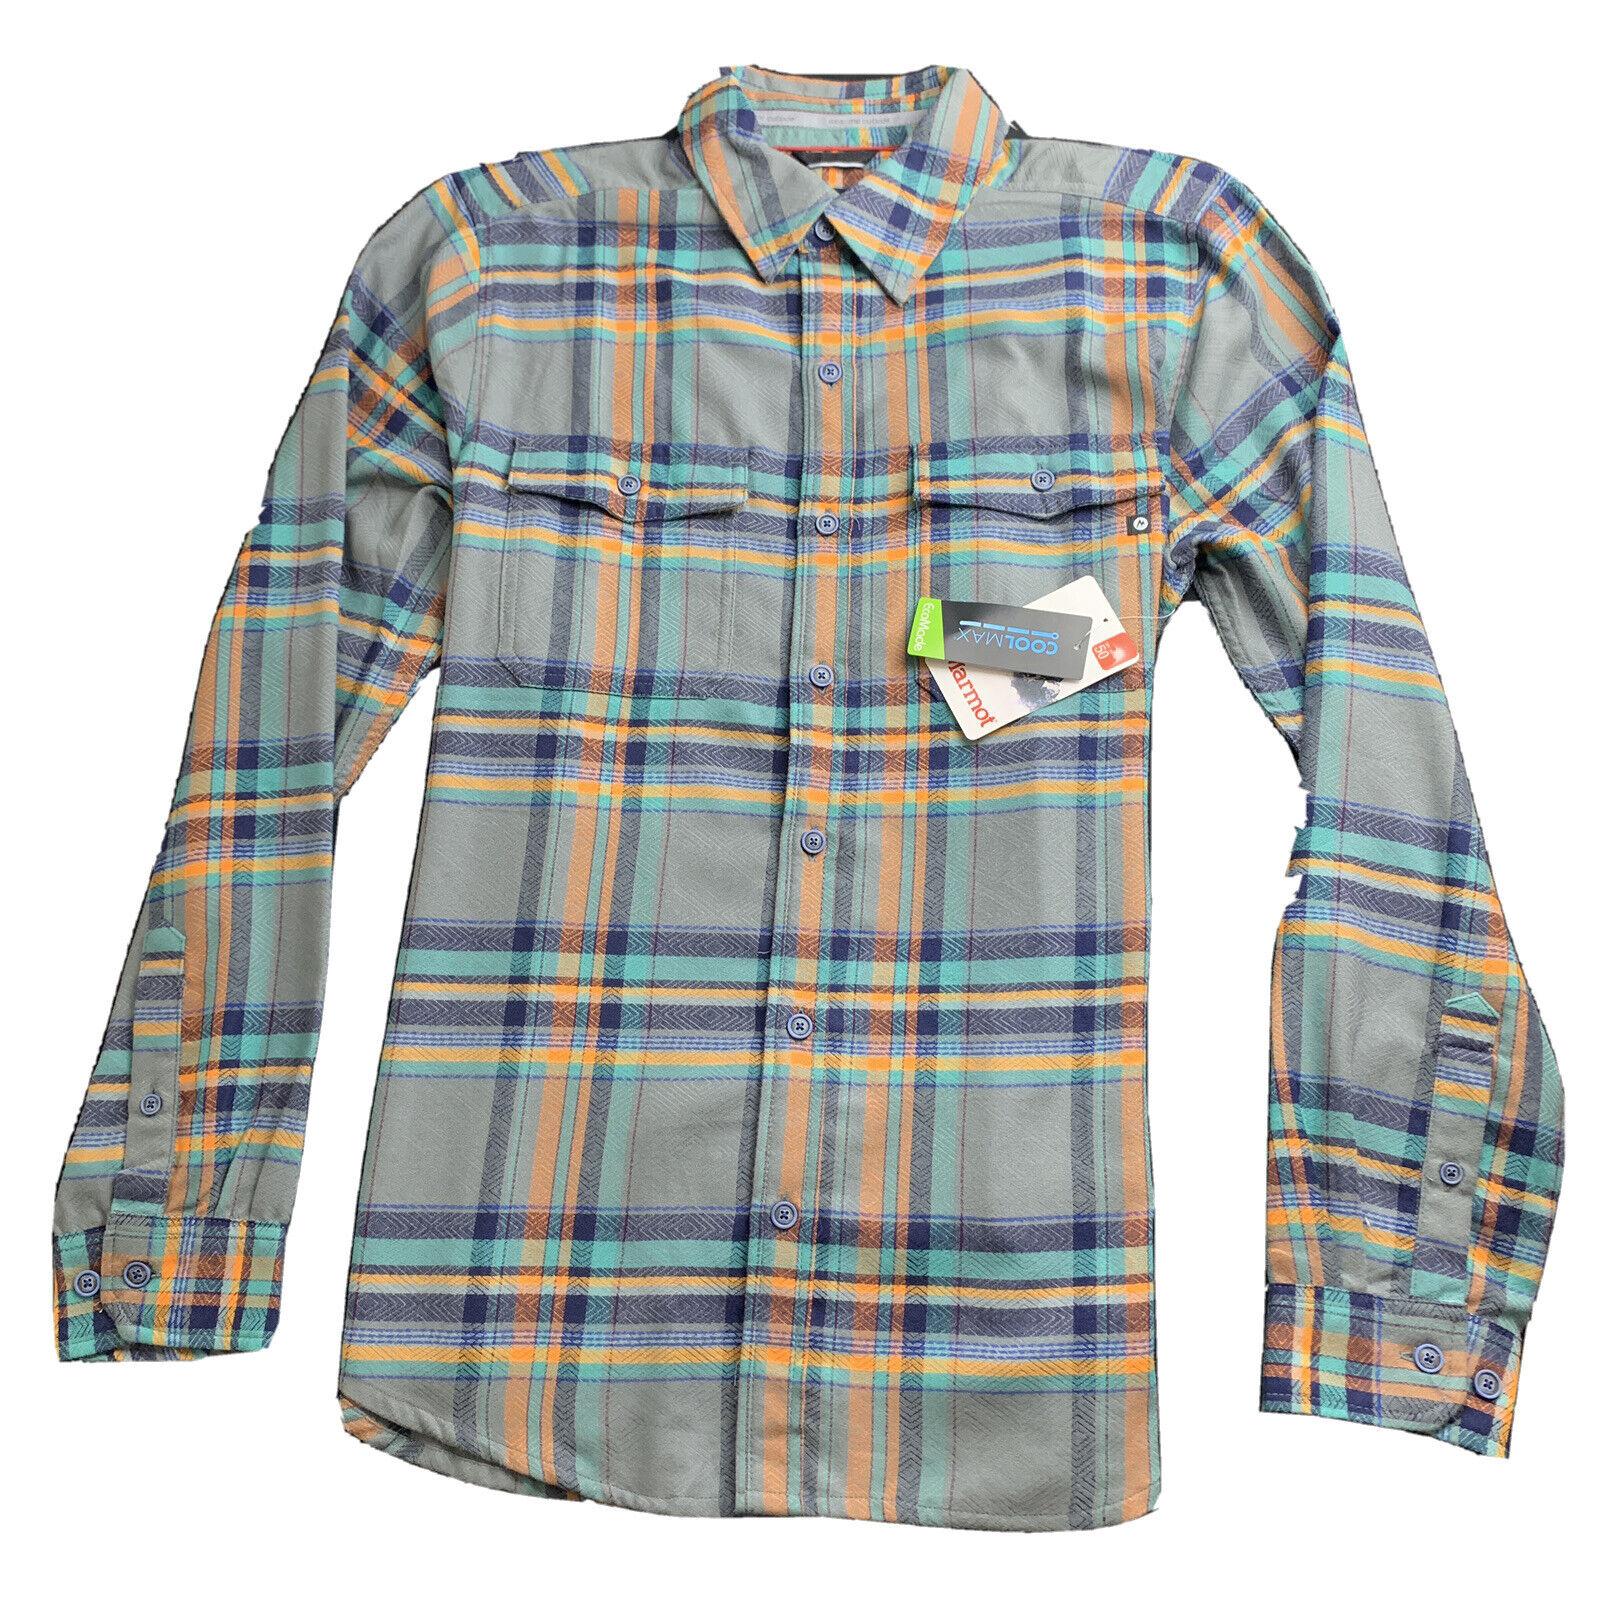 MARMOT Mens Zephyr Cove Mid Wt LS Flannel XL Gray Plaid NWT 85 - $31.44